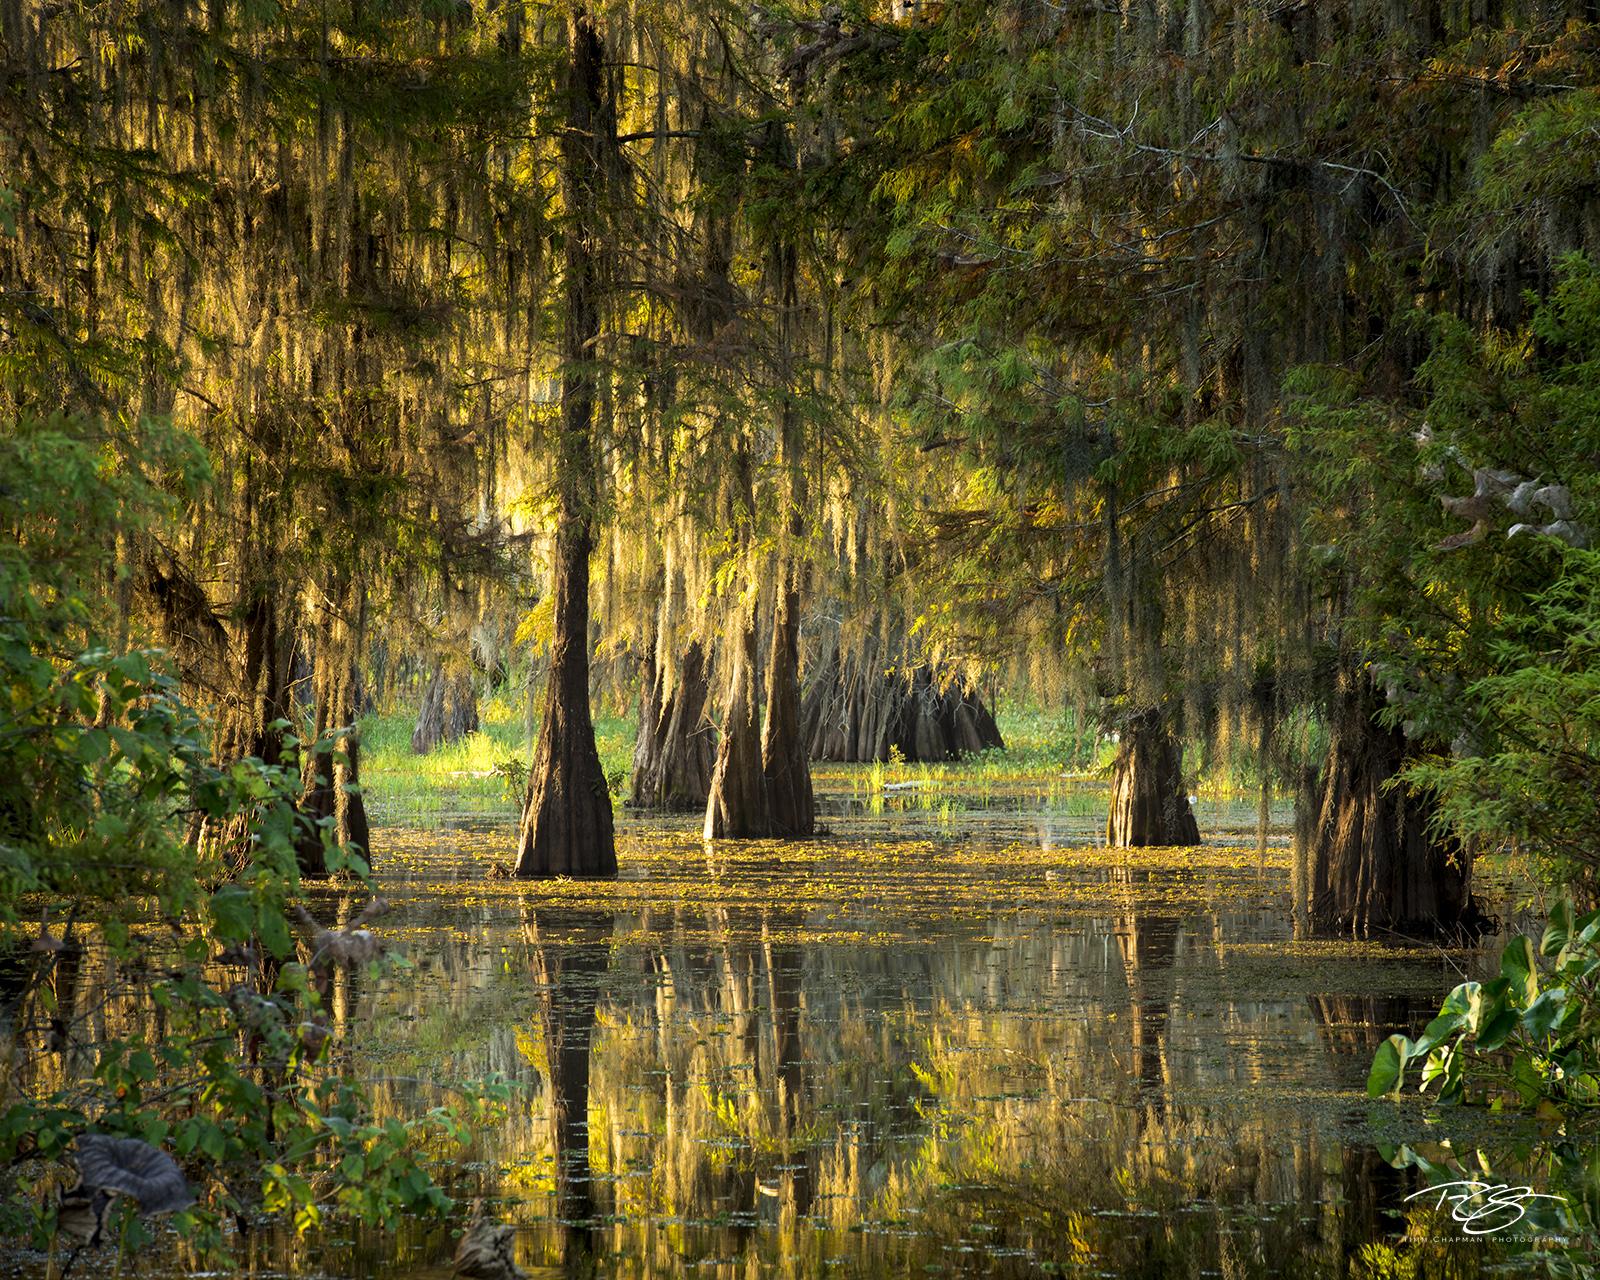 swamp, bayou, louisiana, dawn, early morning, quiet, reflection, bald cypress, tree, cypress, atchafalaya basin, lake martin, daybreak, morning, silhouette, swamp thing, gators, swamp people, photo